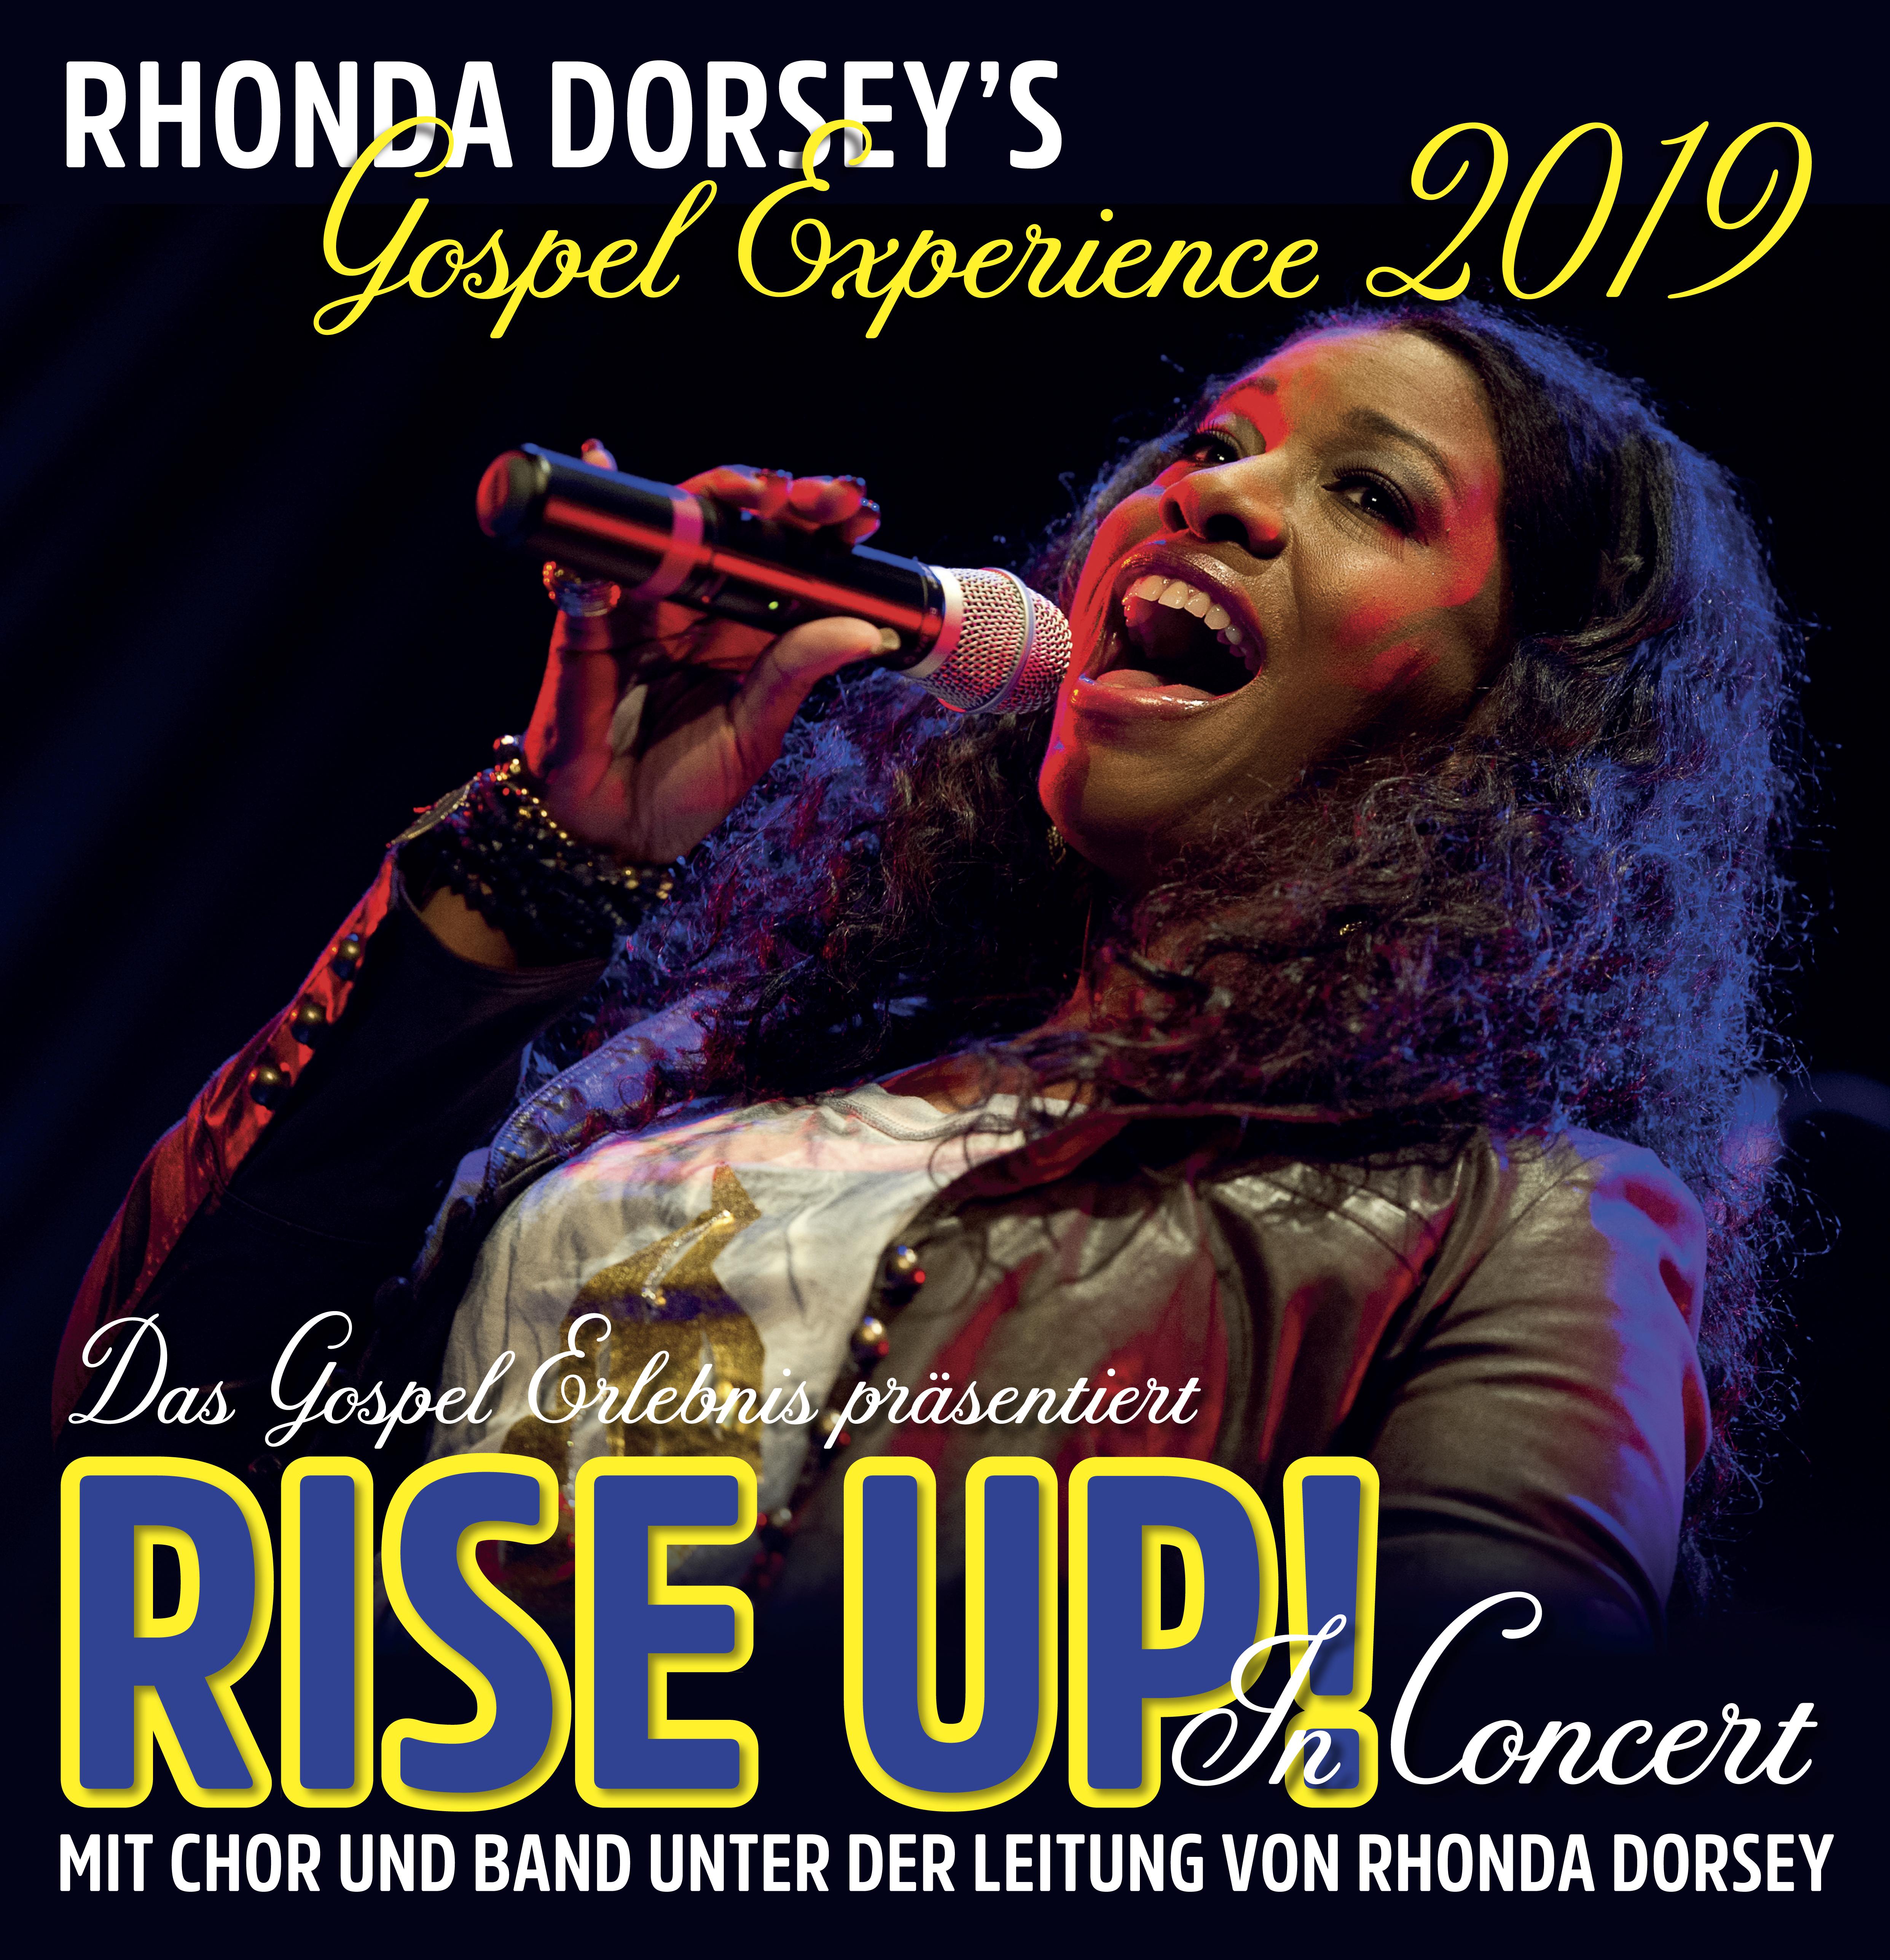 Rhonda Dorsey's Gospel Experience